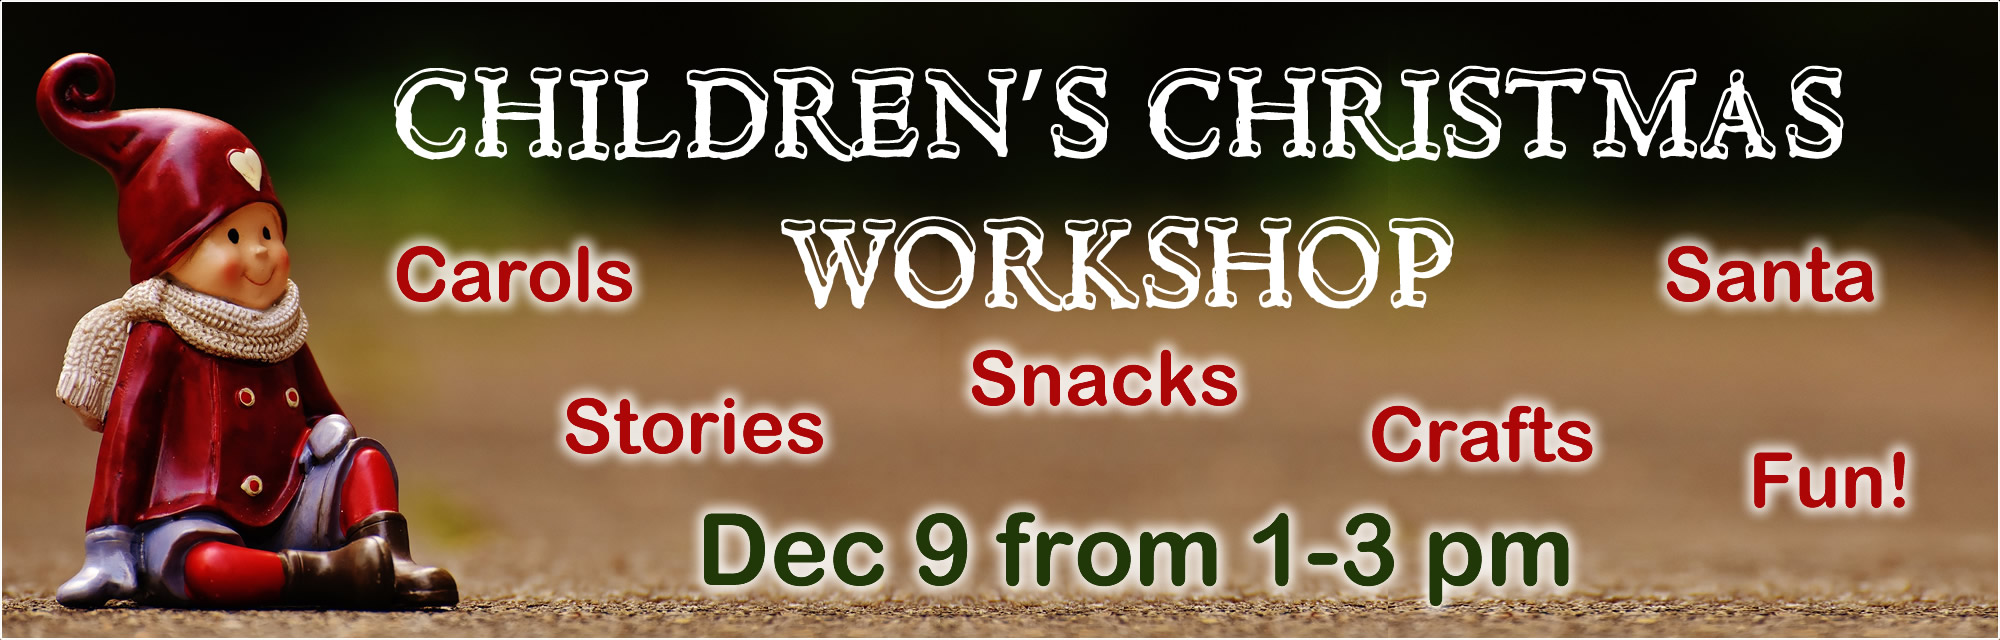 Children's Christmas Workshop